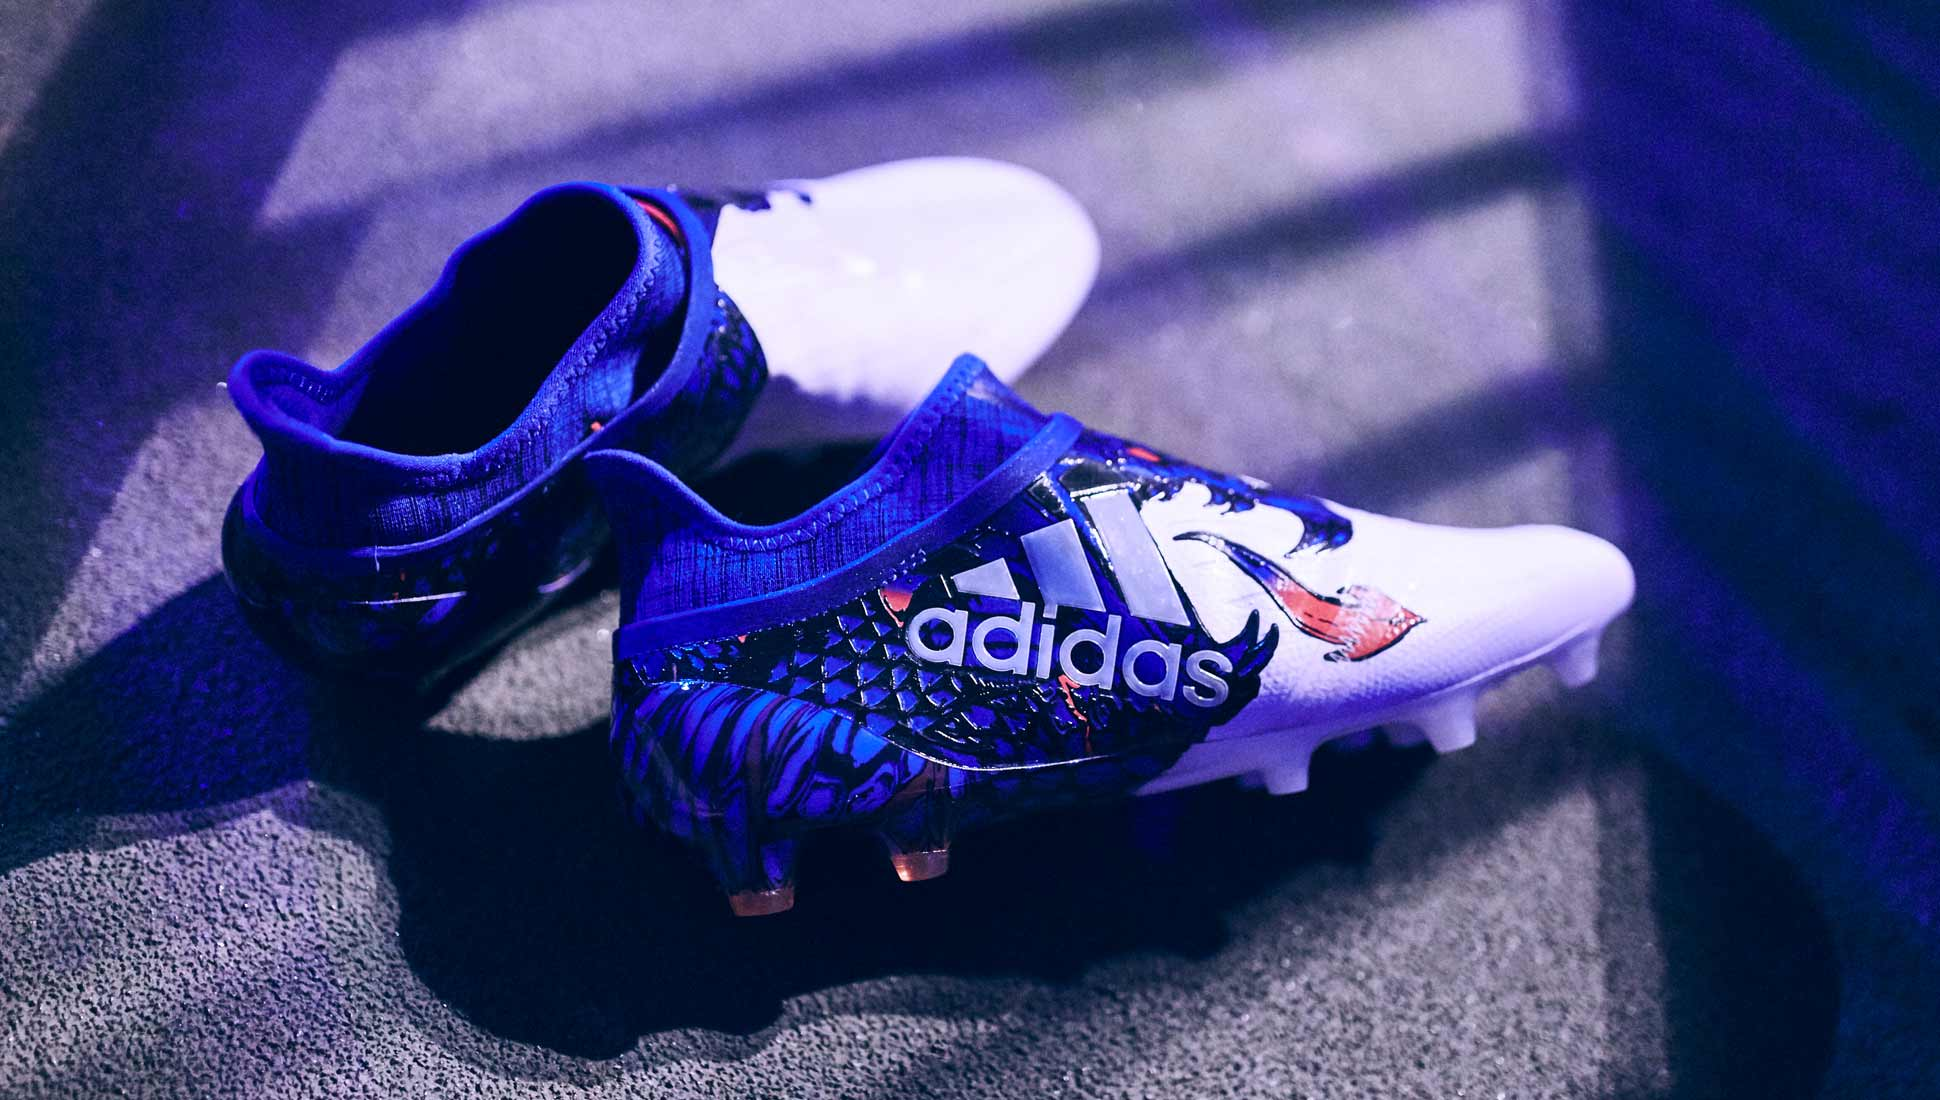 adidas X 16 Purechaos UCL Dragon Football Boots - SoccerBible